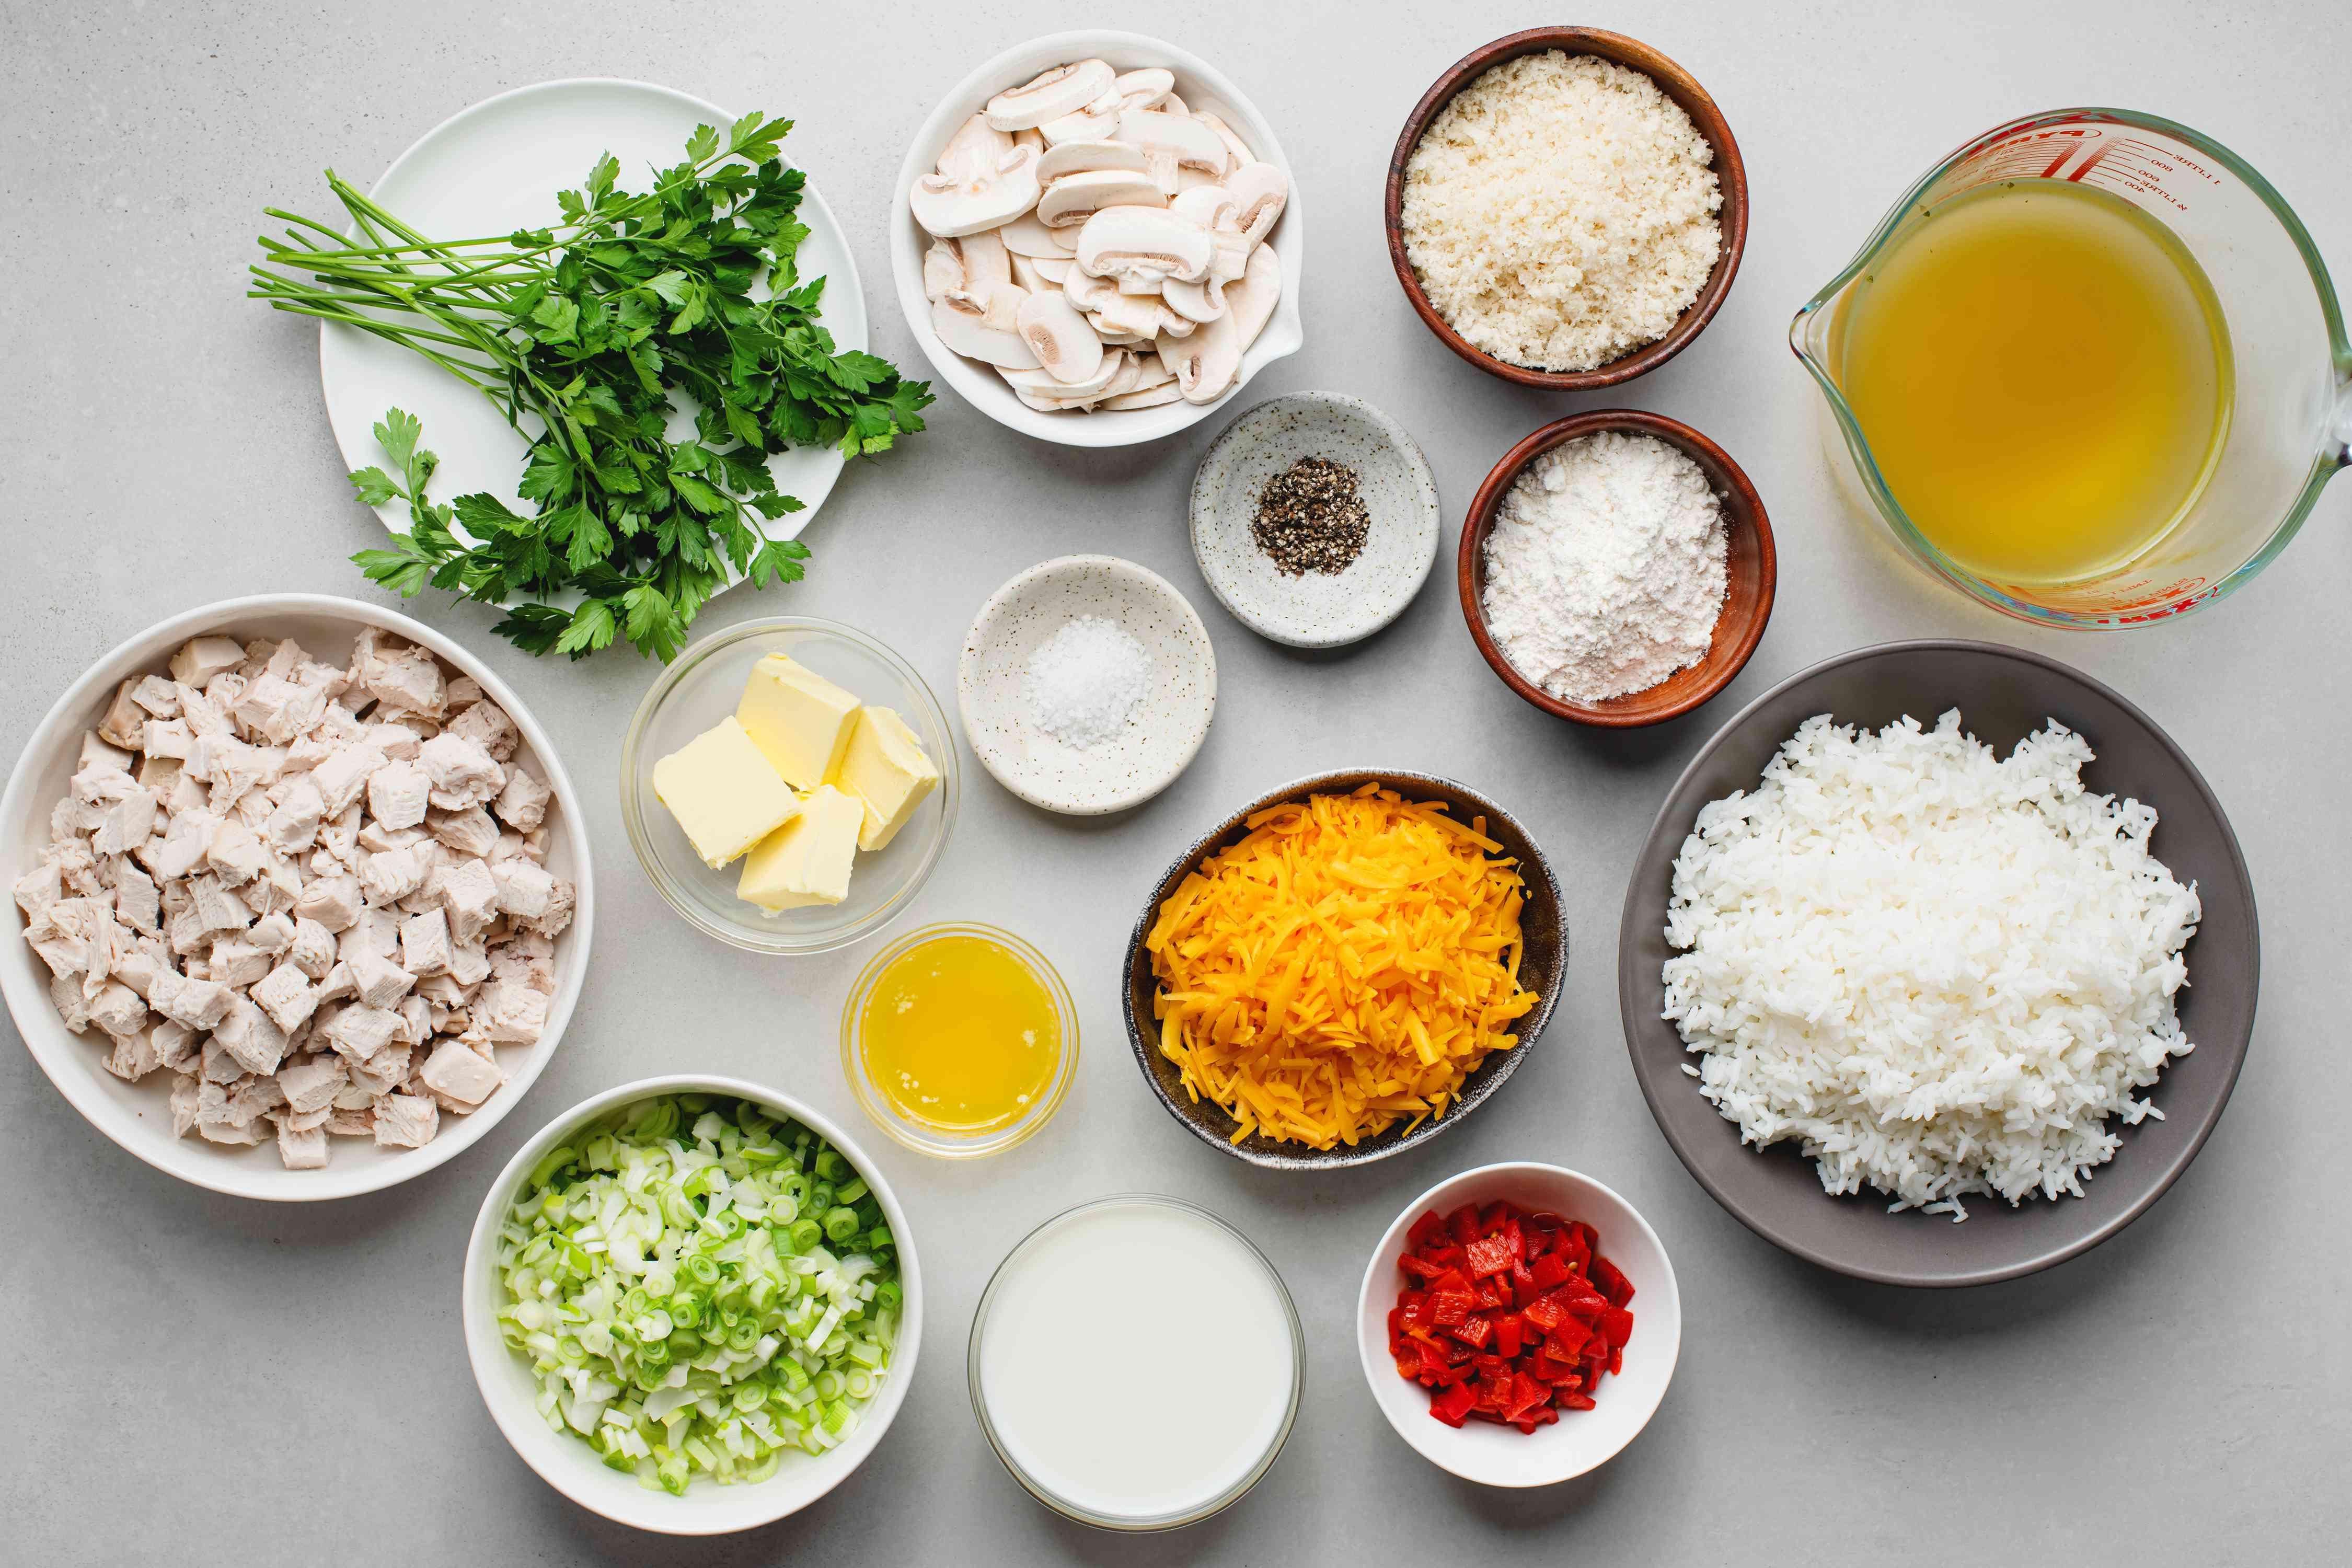 Cheddar Chicken and Rice Casserole ingredients